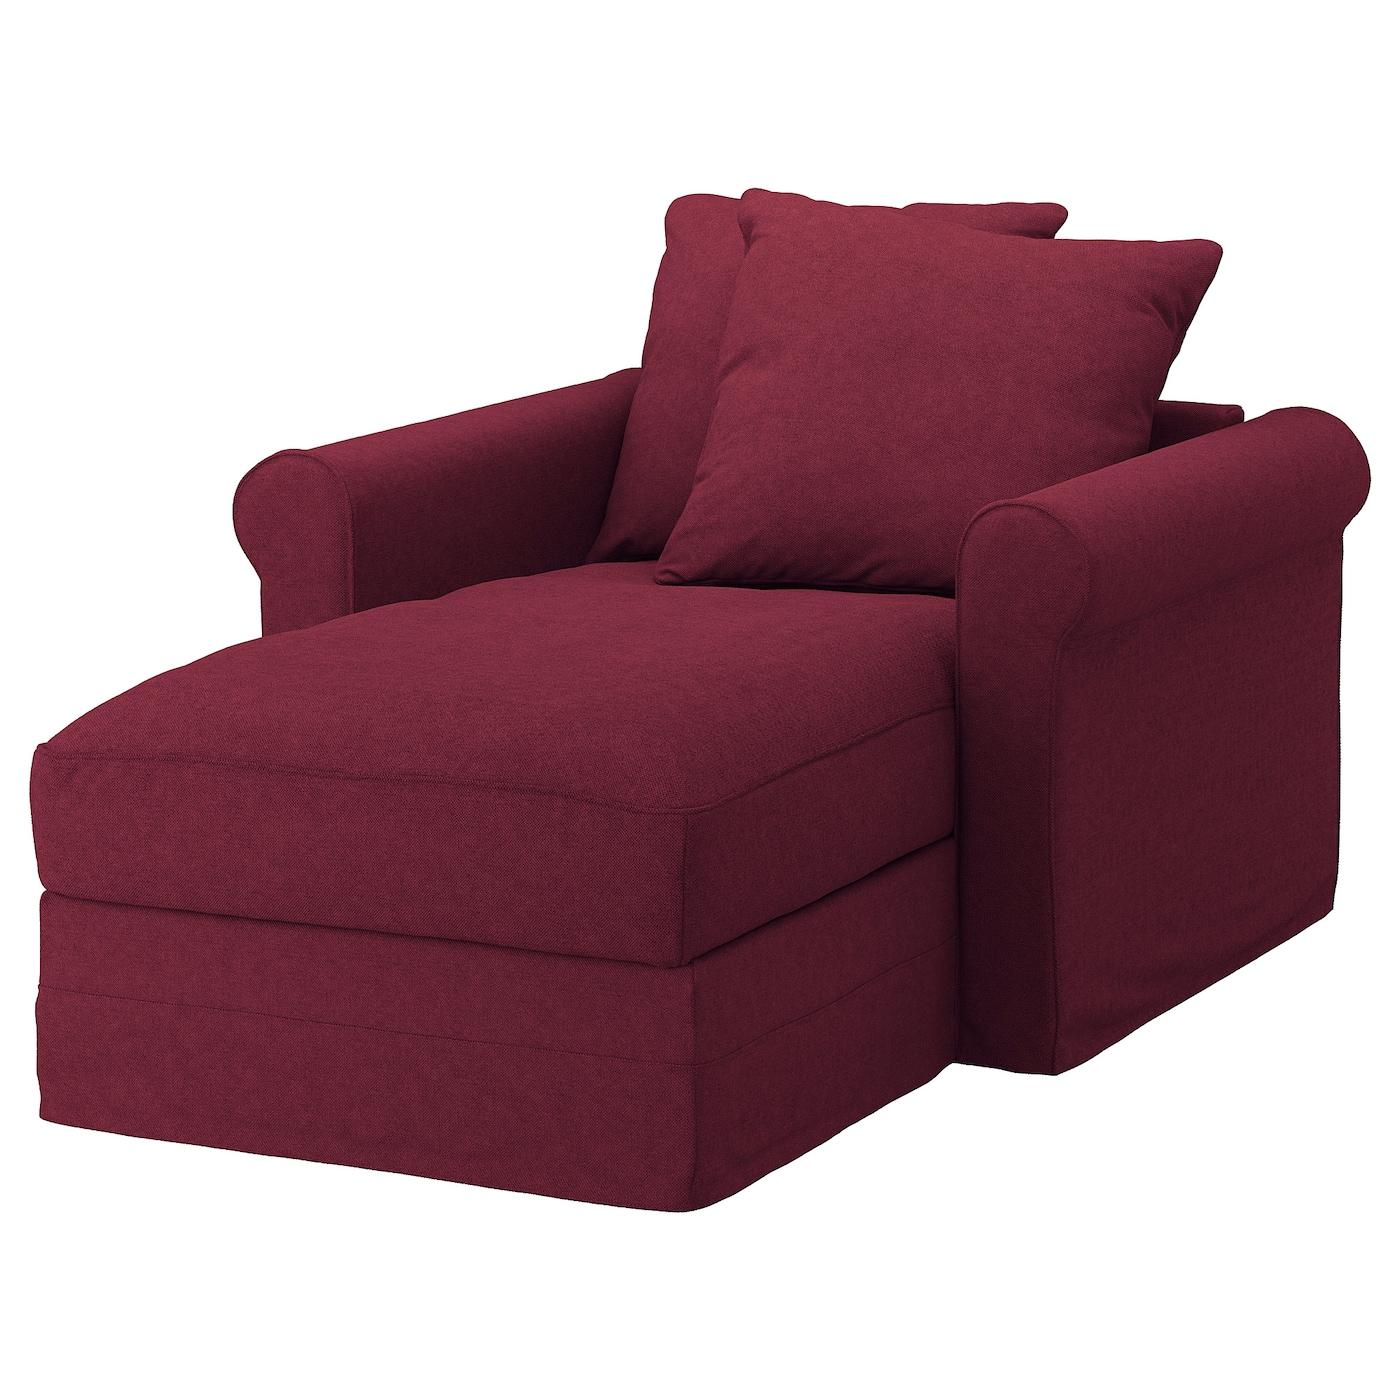 Sofa Covers | IKEA on chaise furniture, chaise recliner chair, chaise sofa sleeper,